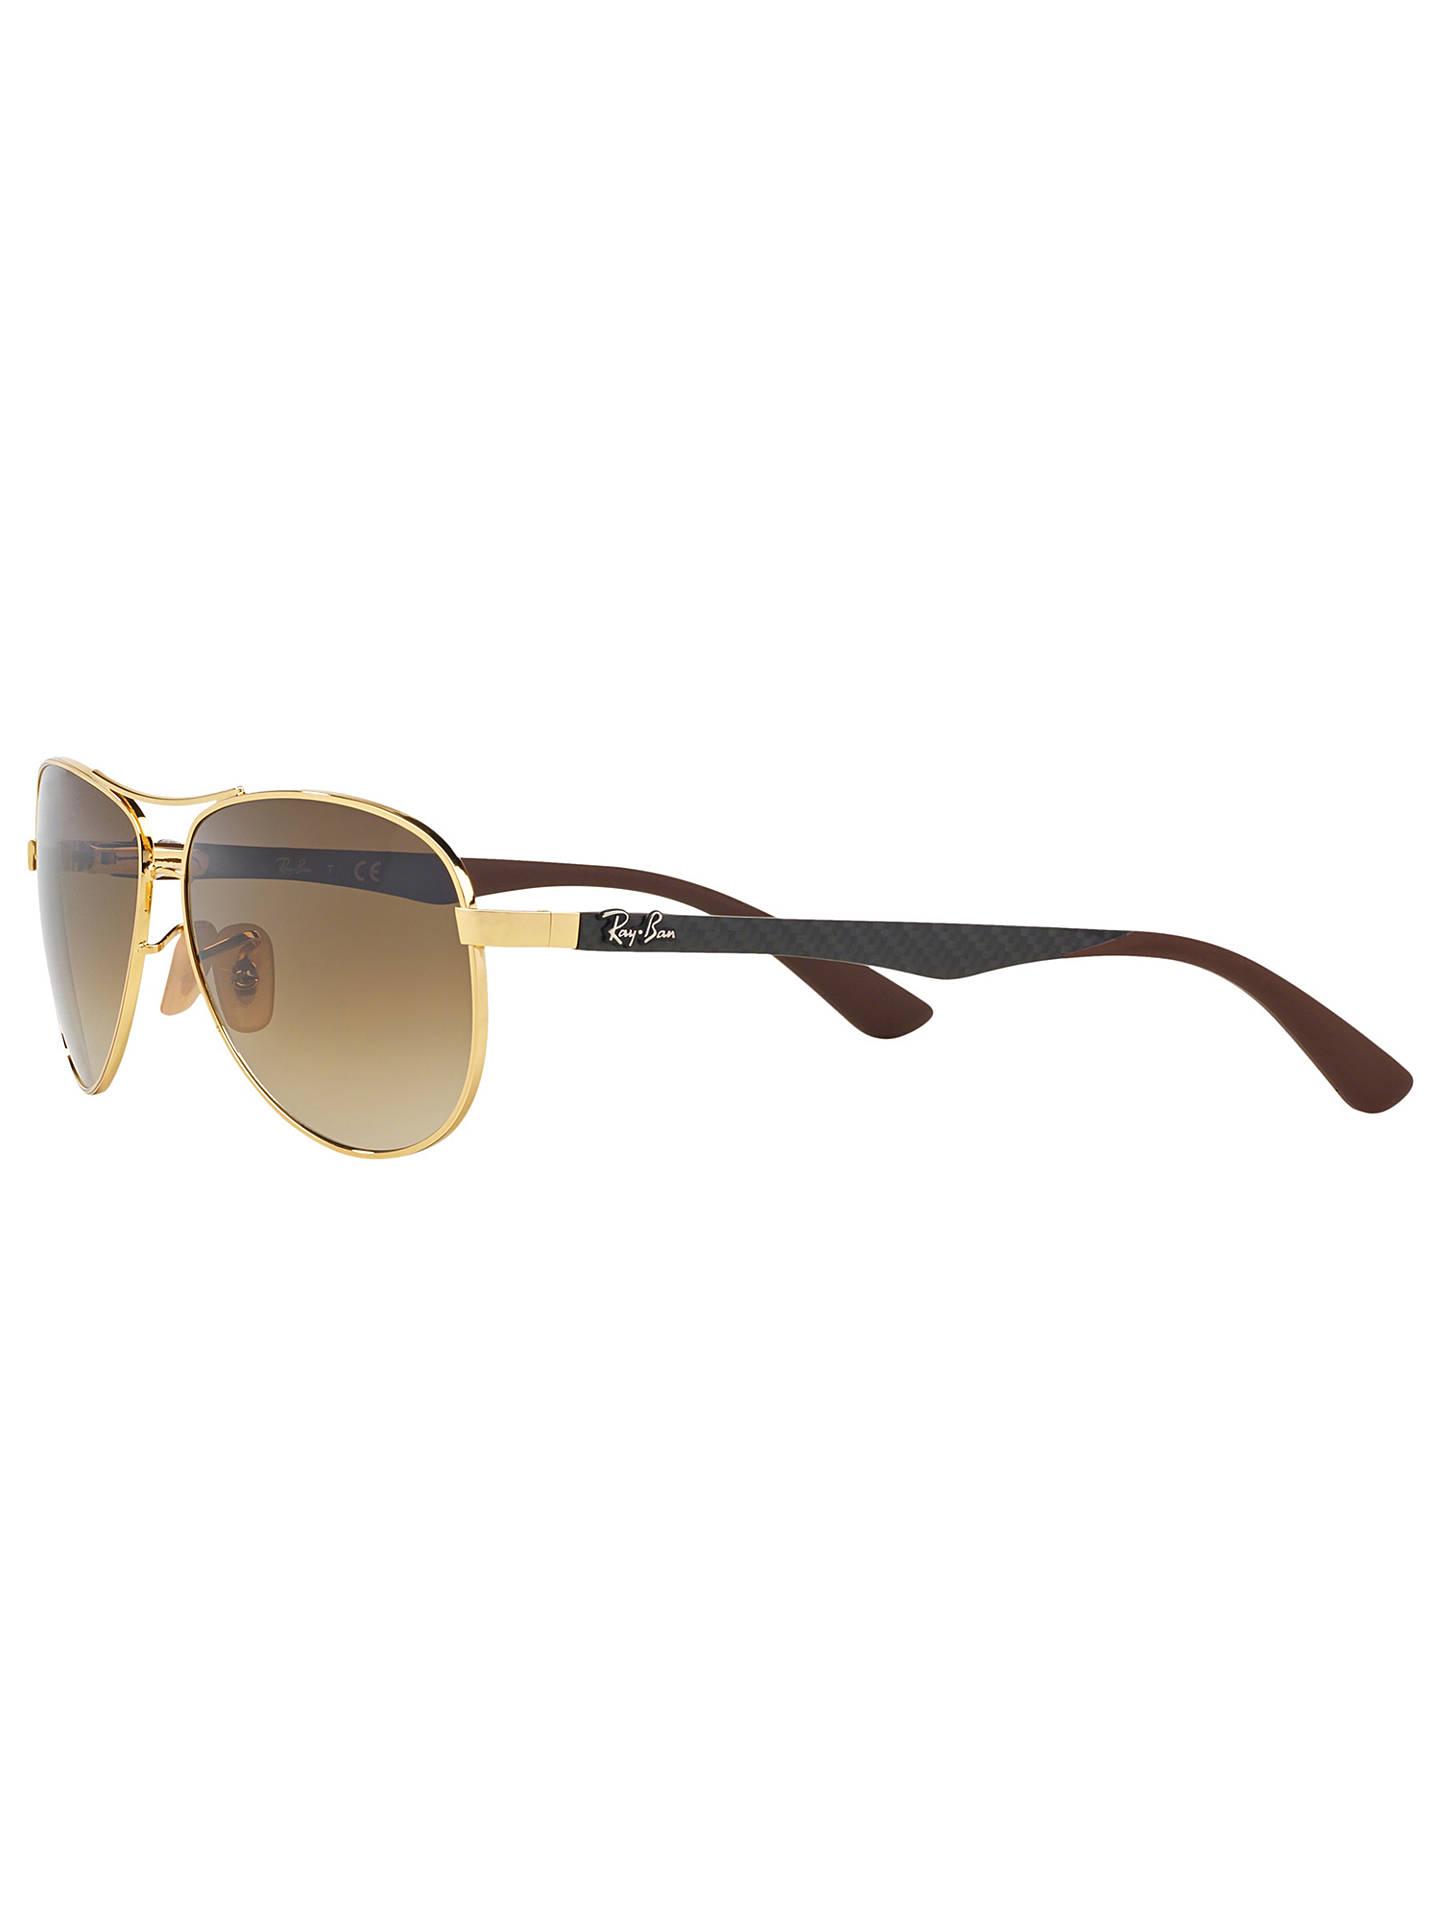 19785c954f Buy Ray-Ban RB8313 Aviator Sunglasses